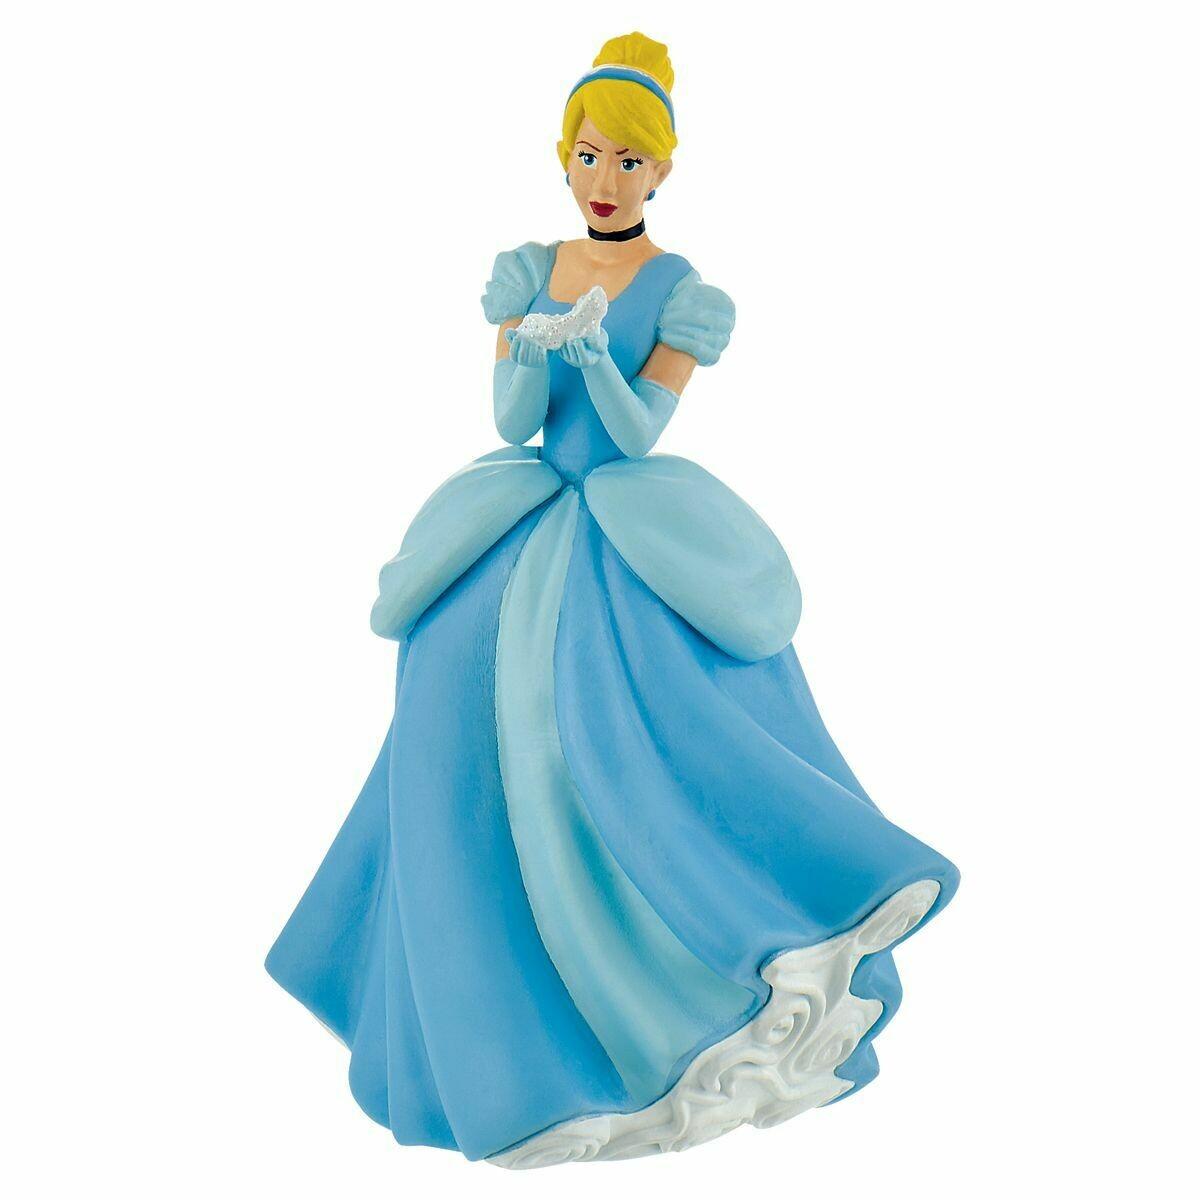 Disney Figure Princess -CINDERELLA - Πλαστική Φιγούρα Σταχτοπούτα - 10.7εκ